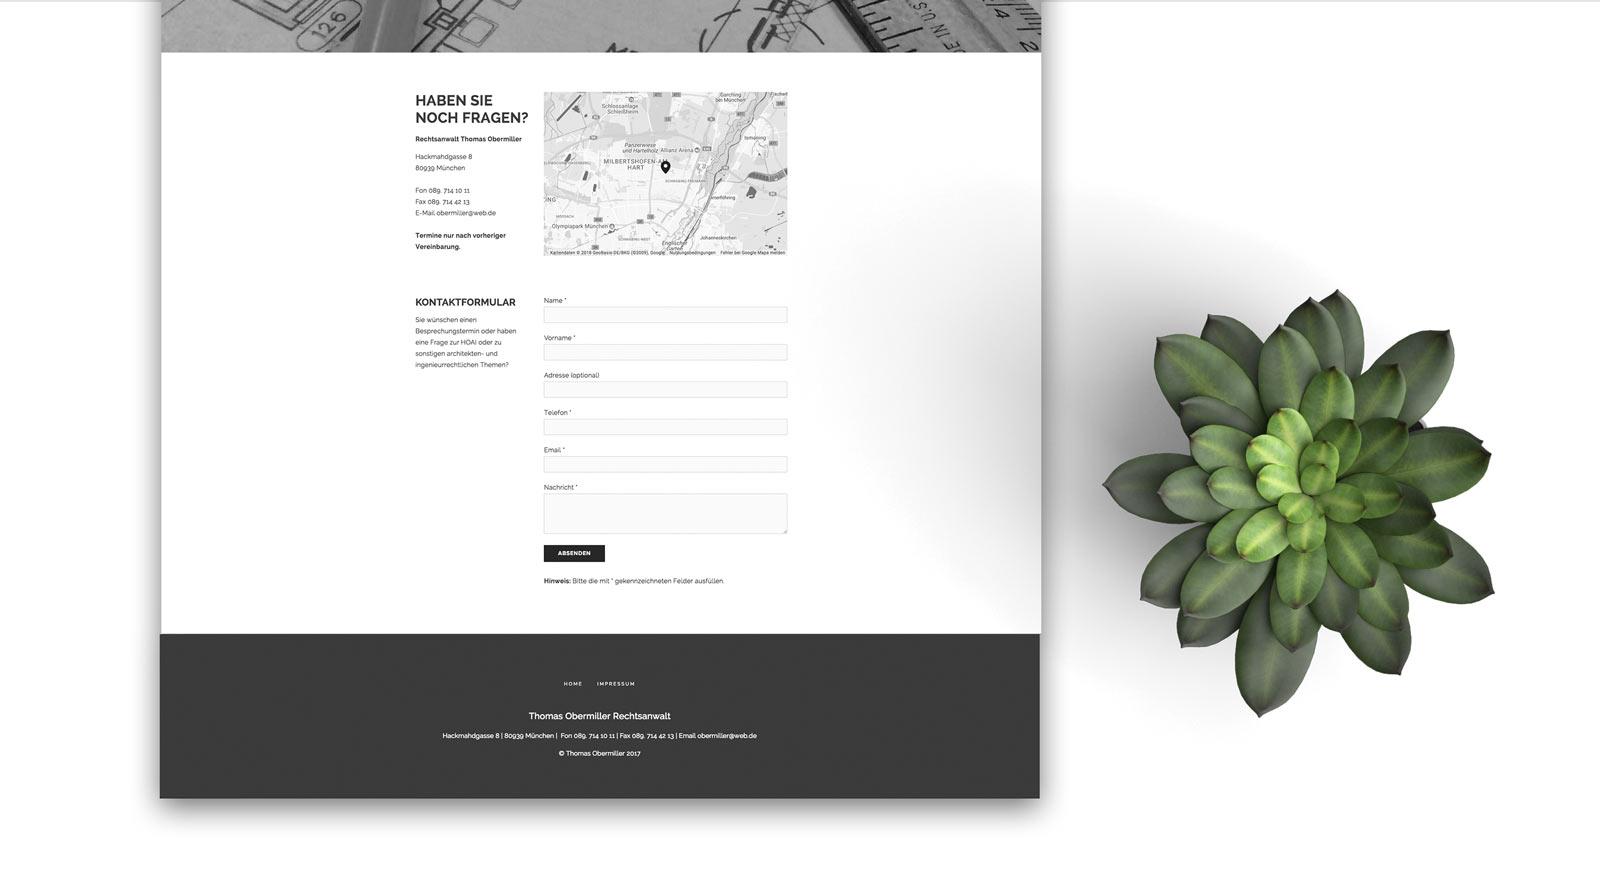 Obermiller_Responsive_Webdesign_8.jpg